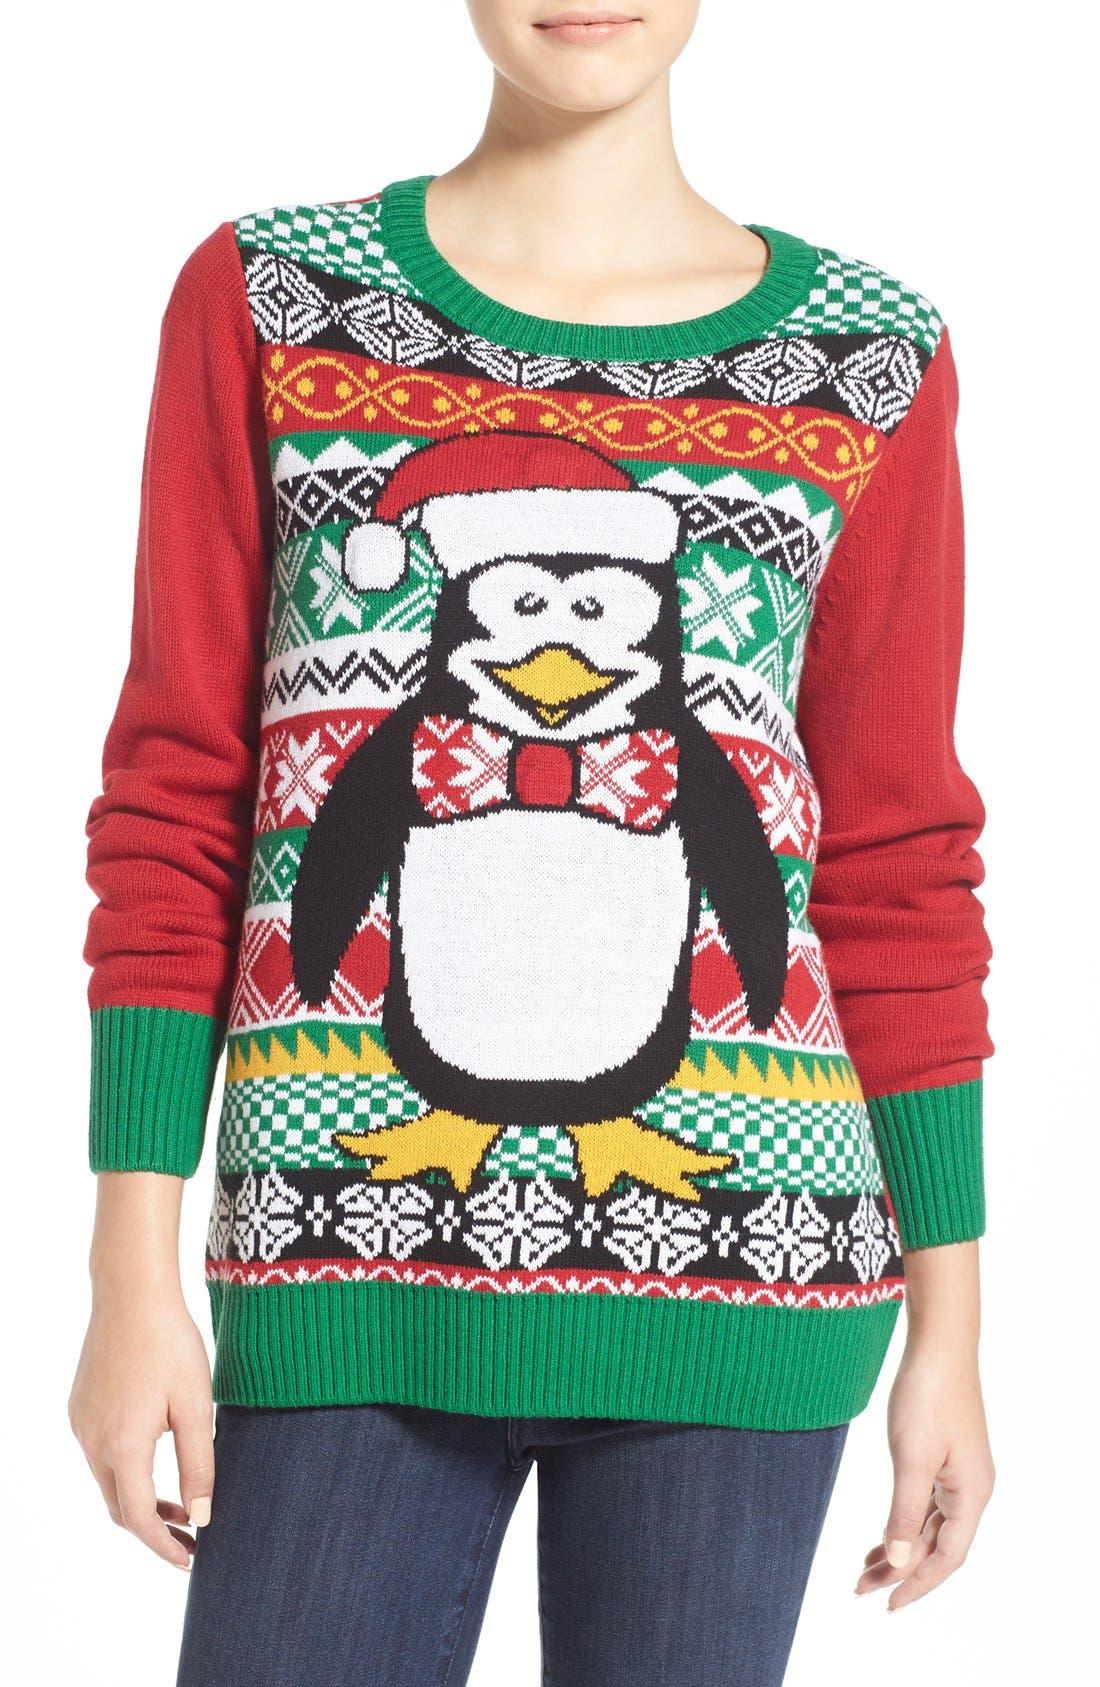 Main Image - Ugly Christmas Sweater 'Penguin' Light-Up Fair Isle Knit Sweater